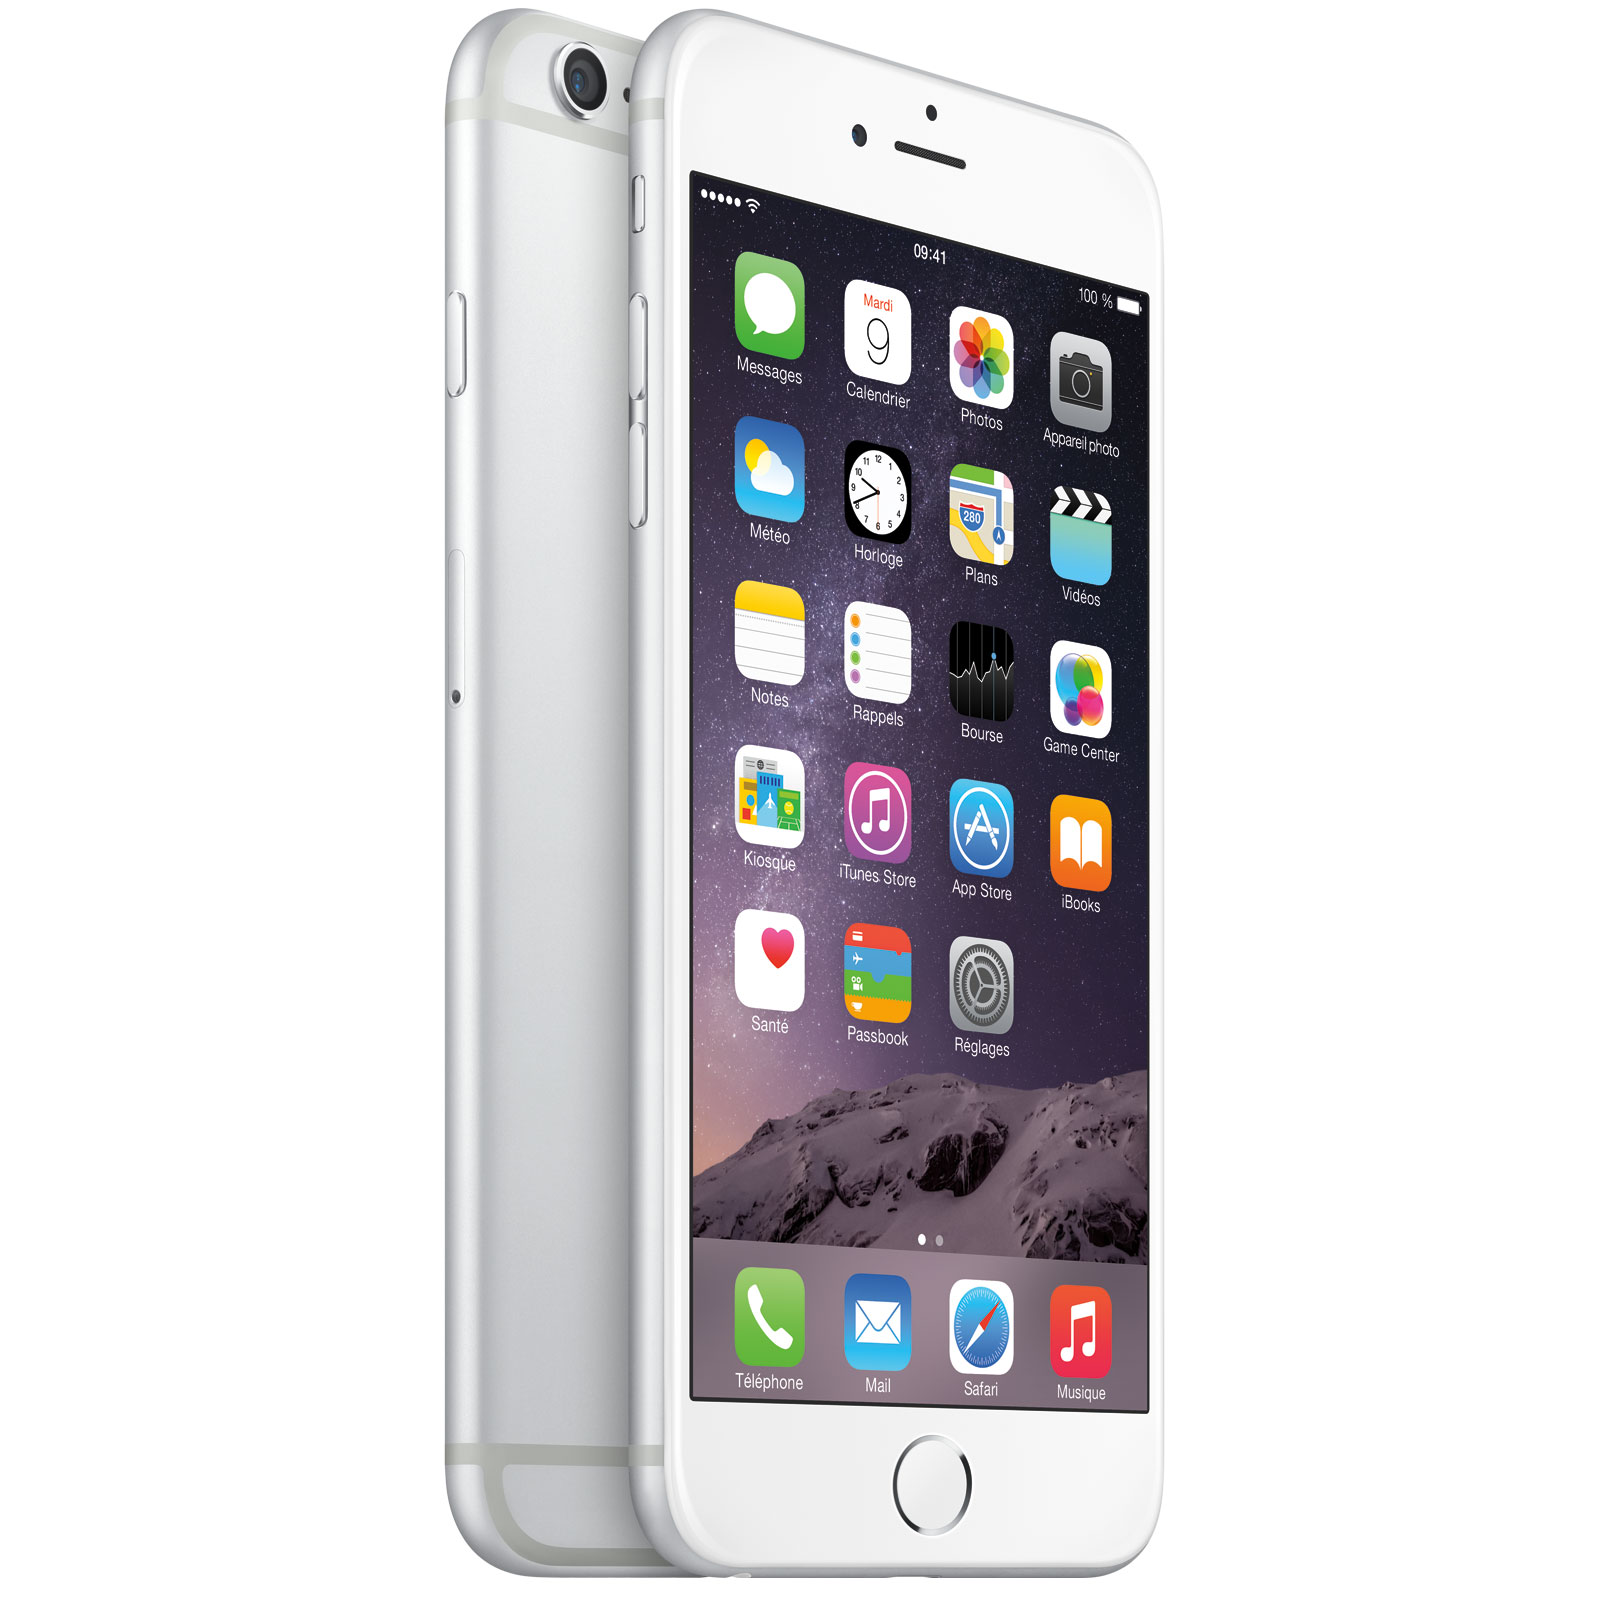 Apple iPhone 6 Plus 16 Go Argent - Mobile & smartphone